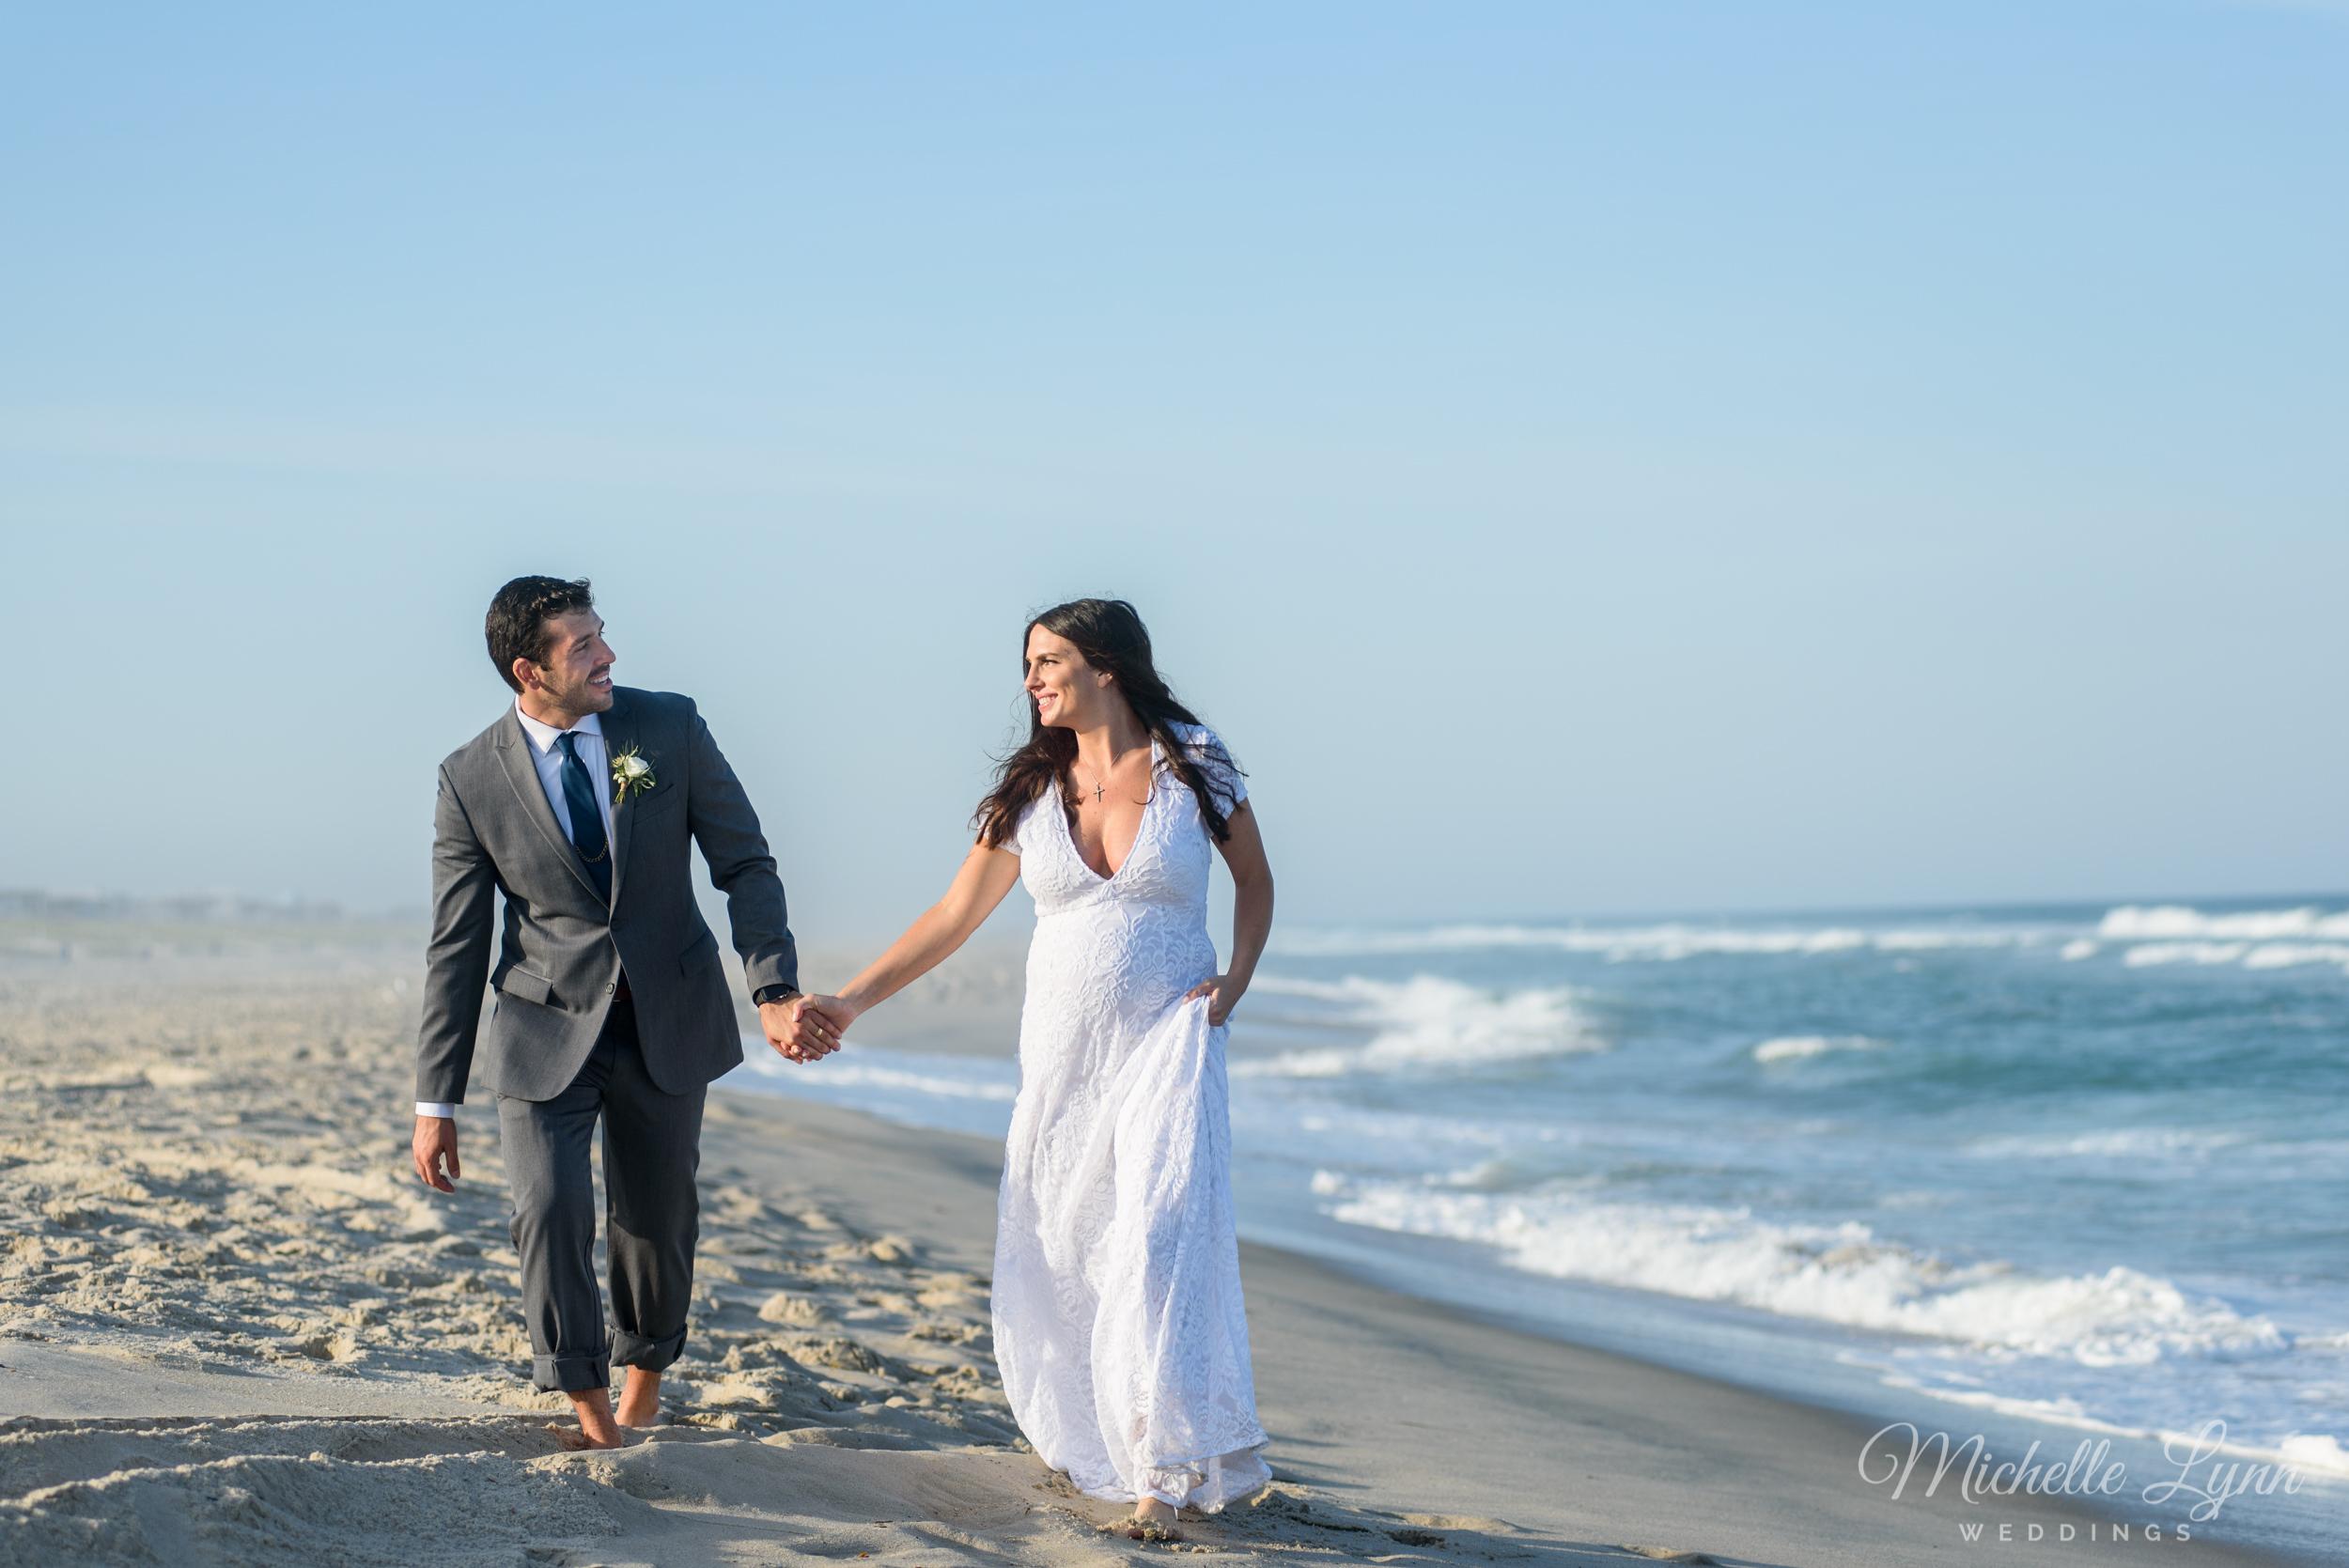 mlw-long-beach-island-new-jersey-wedding-photography-17.jpg